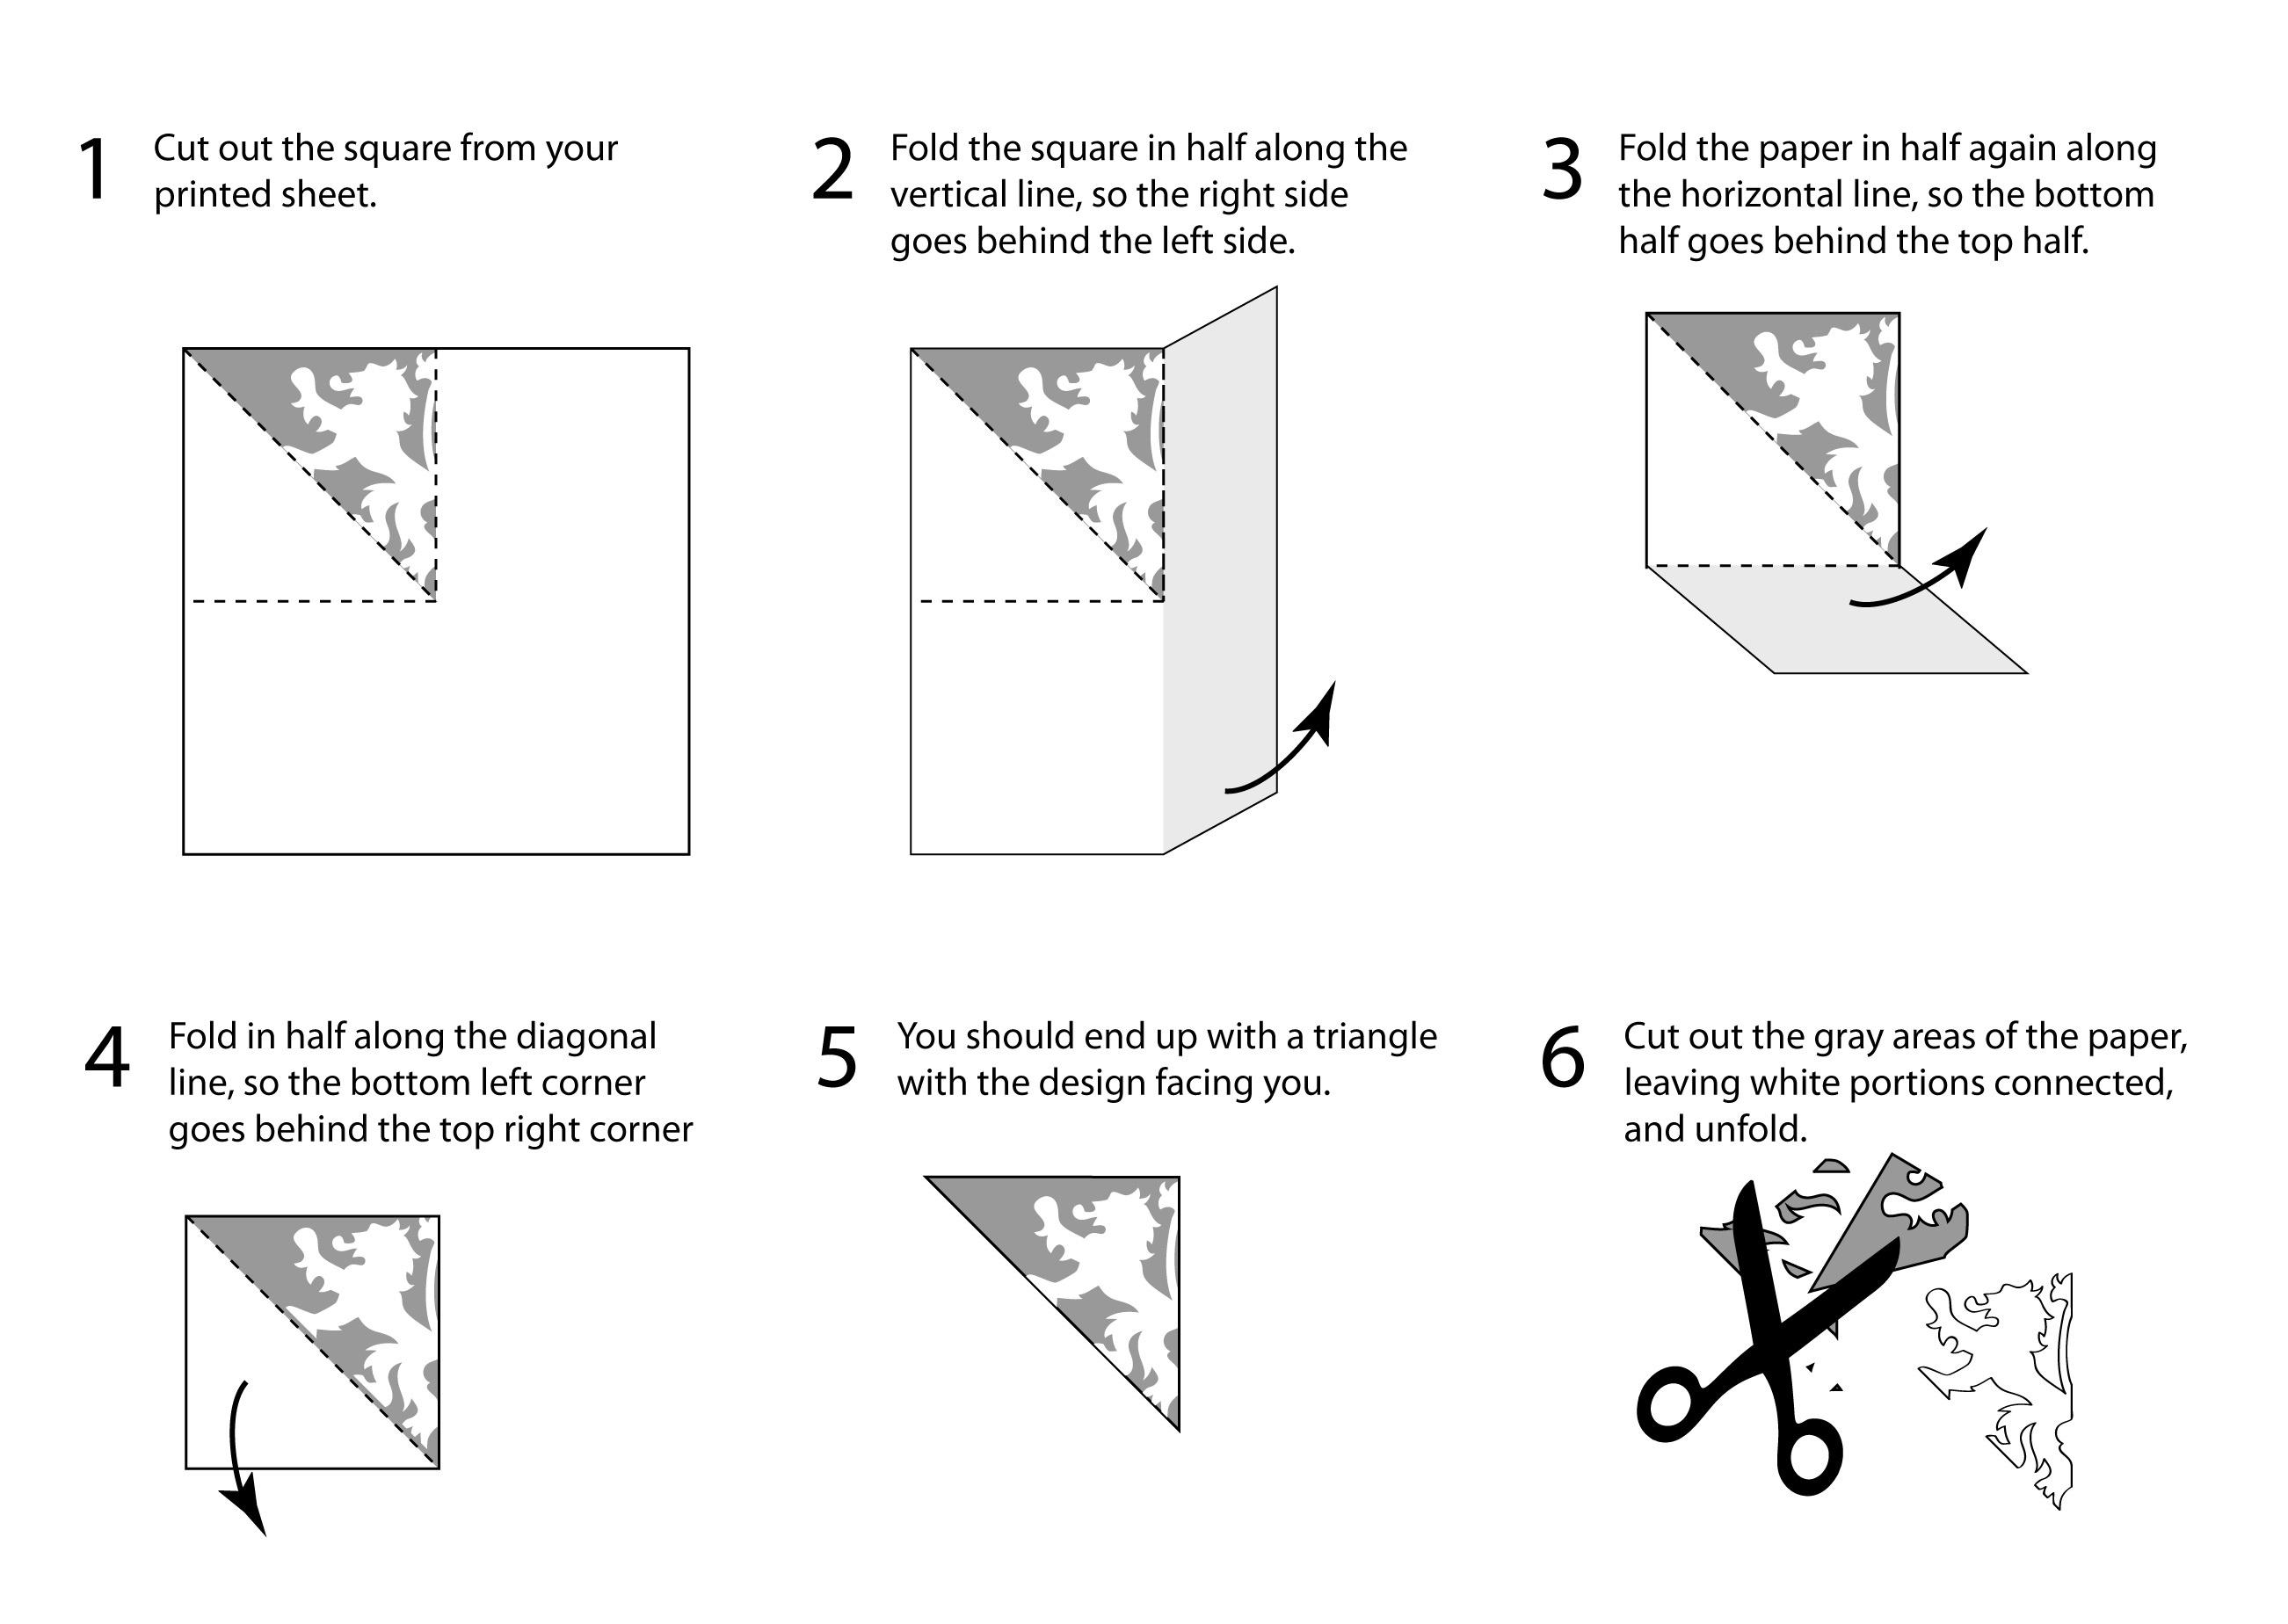 Free Snowflake Patterns Inspiredgame Of Thrones | Krystal Higgins - Free Printable Snowflake Patterns